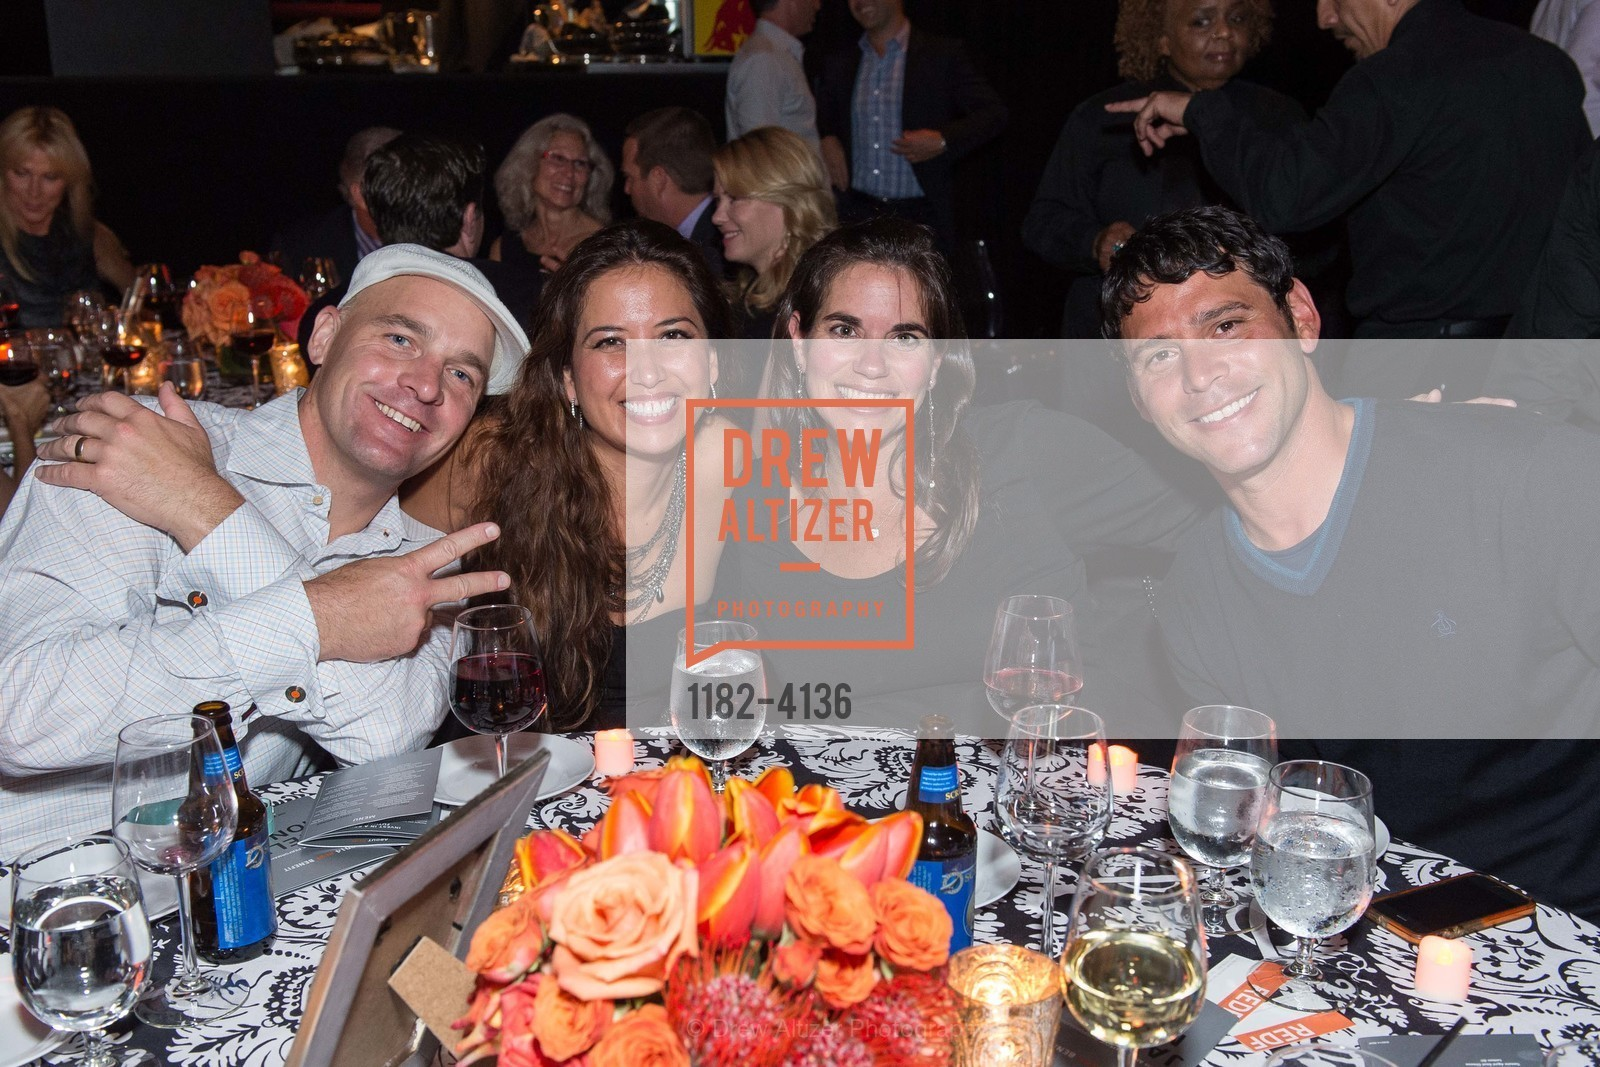 Justin Bowen, Amanda Fuyerabend, Lisa Gorman, Ari Gorman, Photo #1182-4136